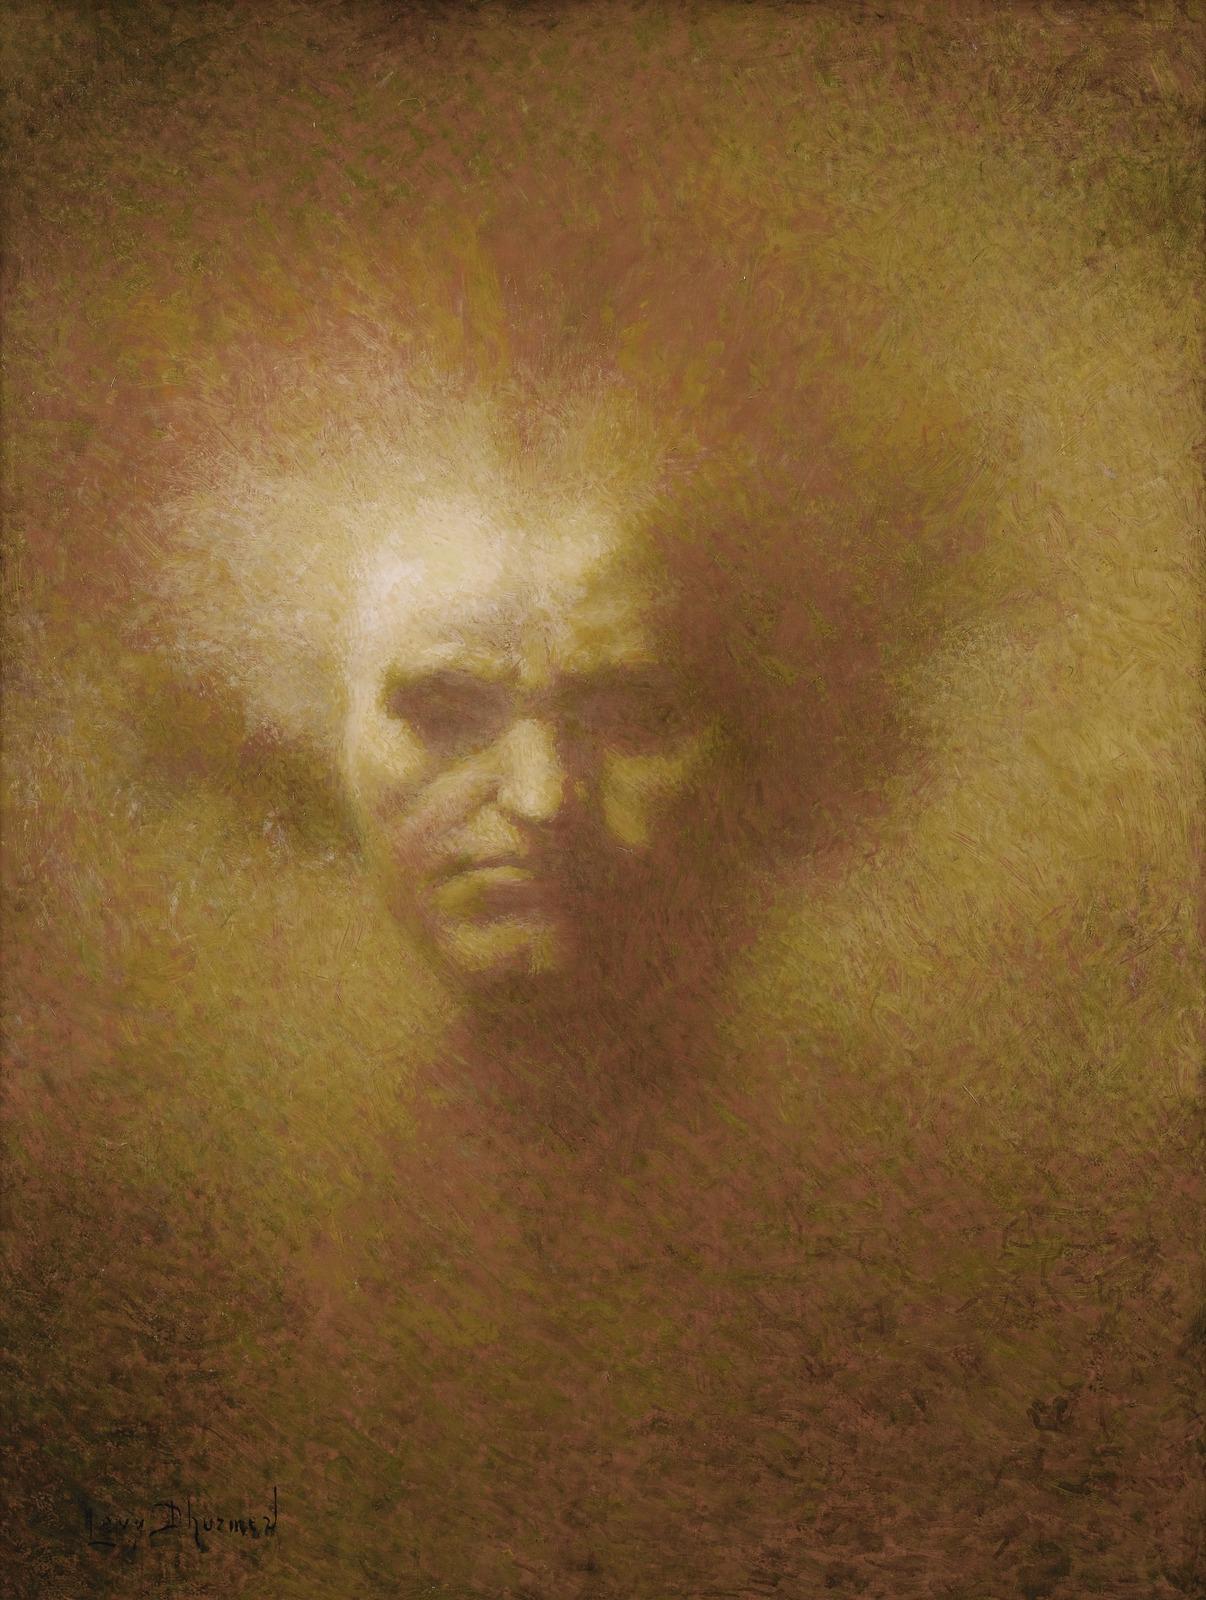 Бетховен (Beethoven)_65 х 50.4_х.,м._Частное собрание.jpg